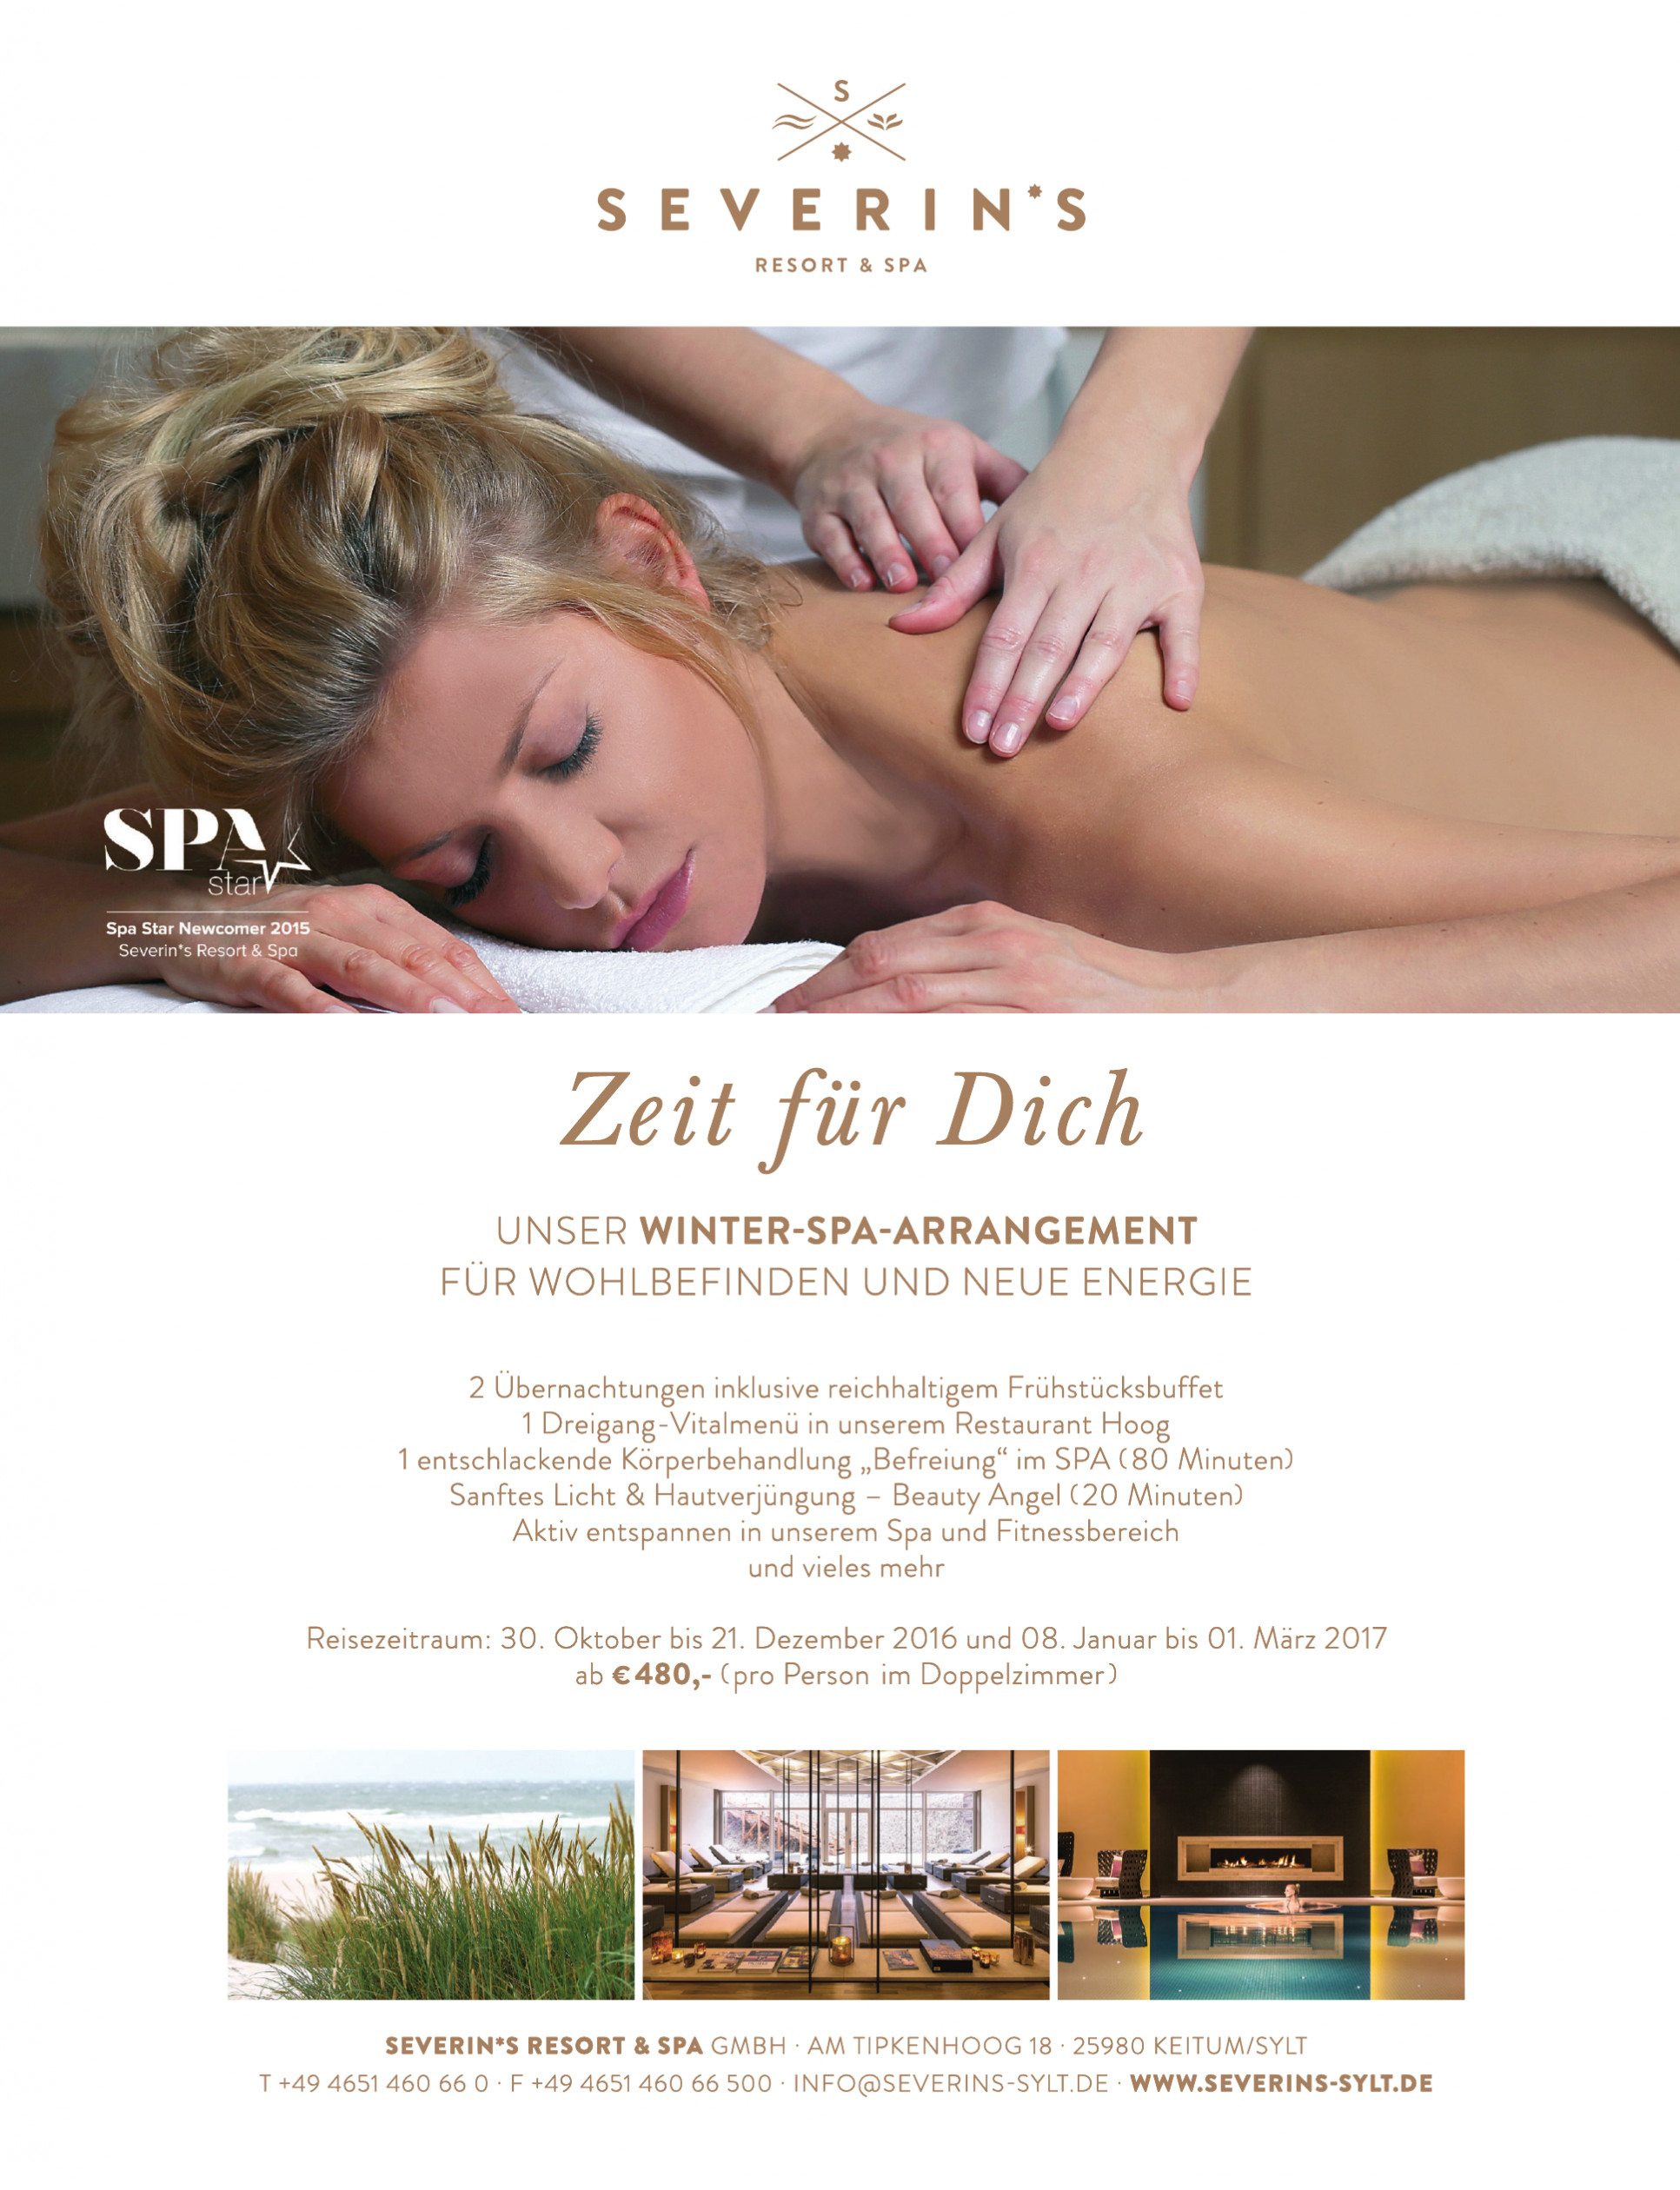 Severin´s Resort & SPA GmbH